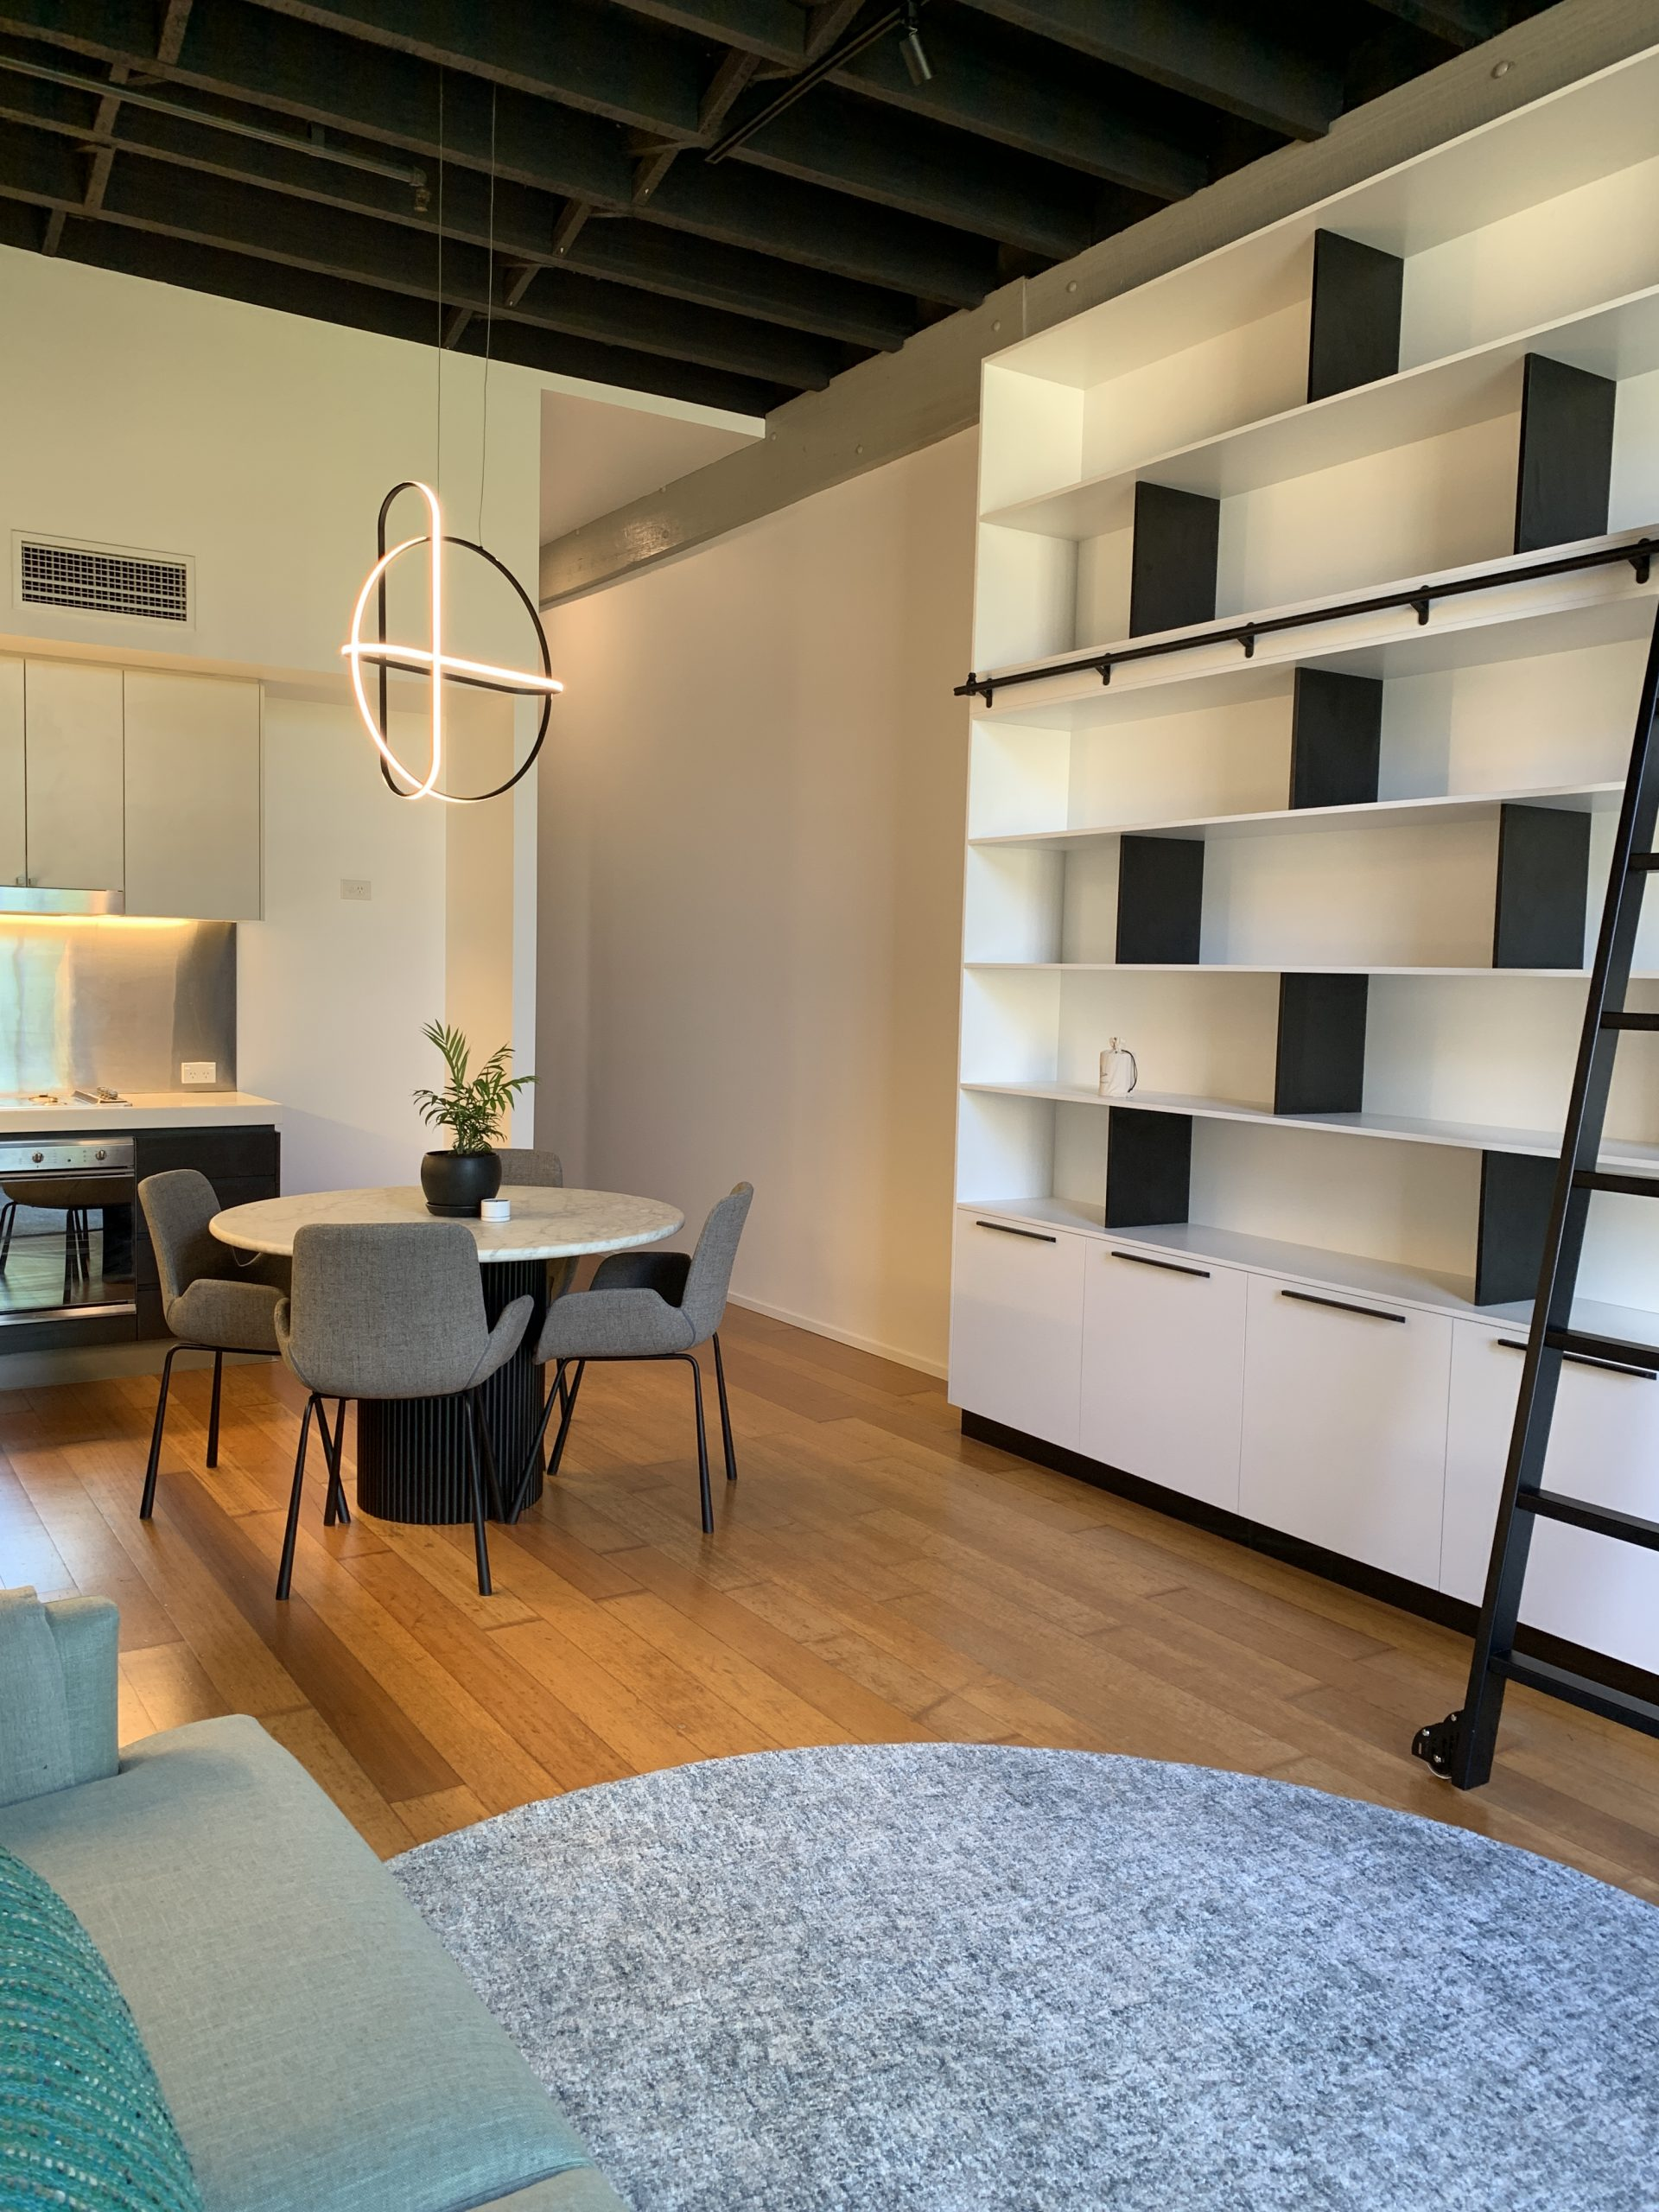 https://www.ivyandfinch.com.au/wp-content/uploads/2021/02/Interior-Design-Teneriffe-Lounge-Room-scaled.jpg